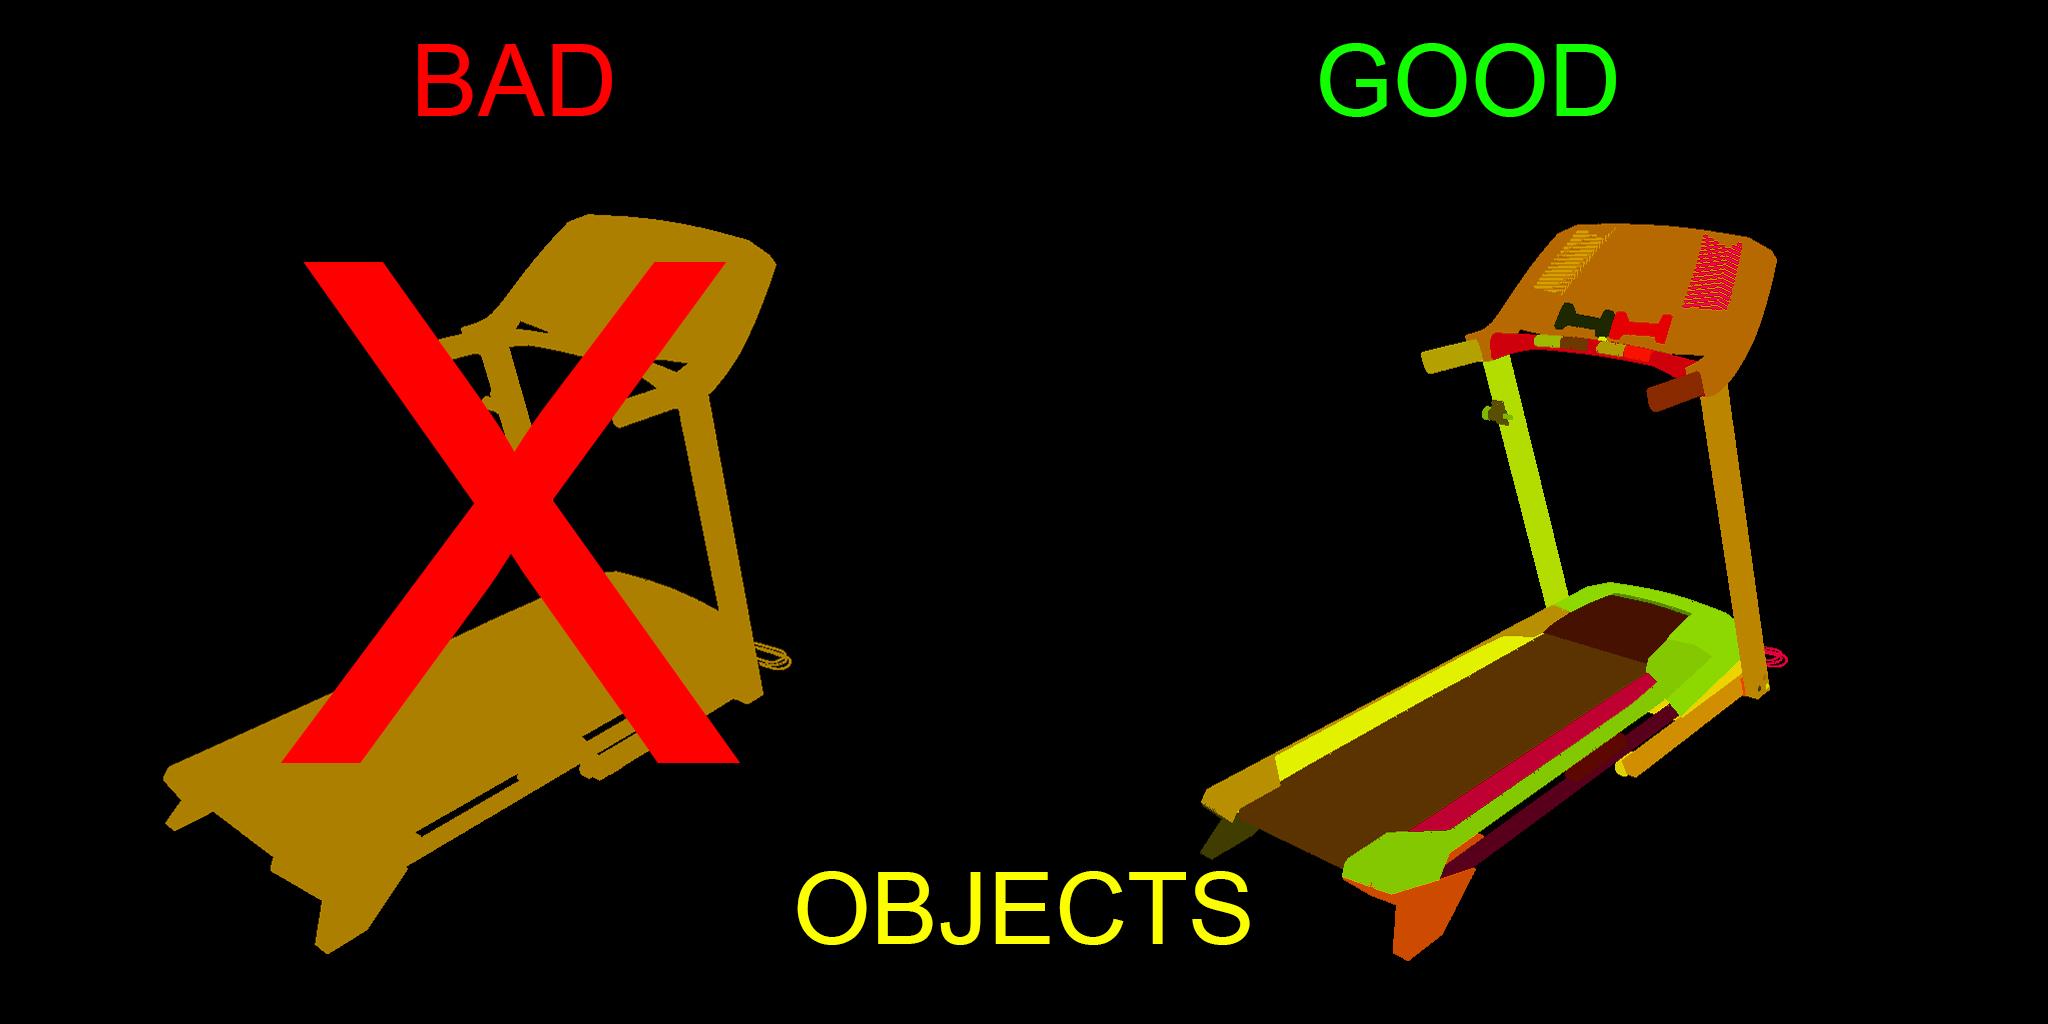 Treadmill_GoodvBad_Good